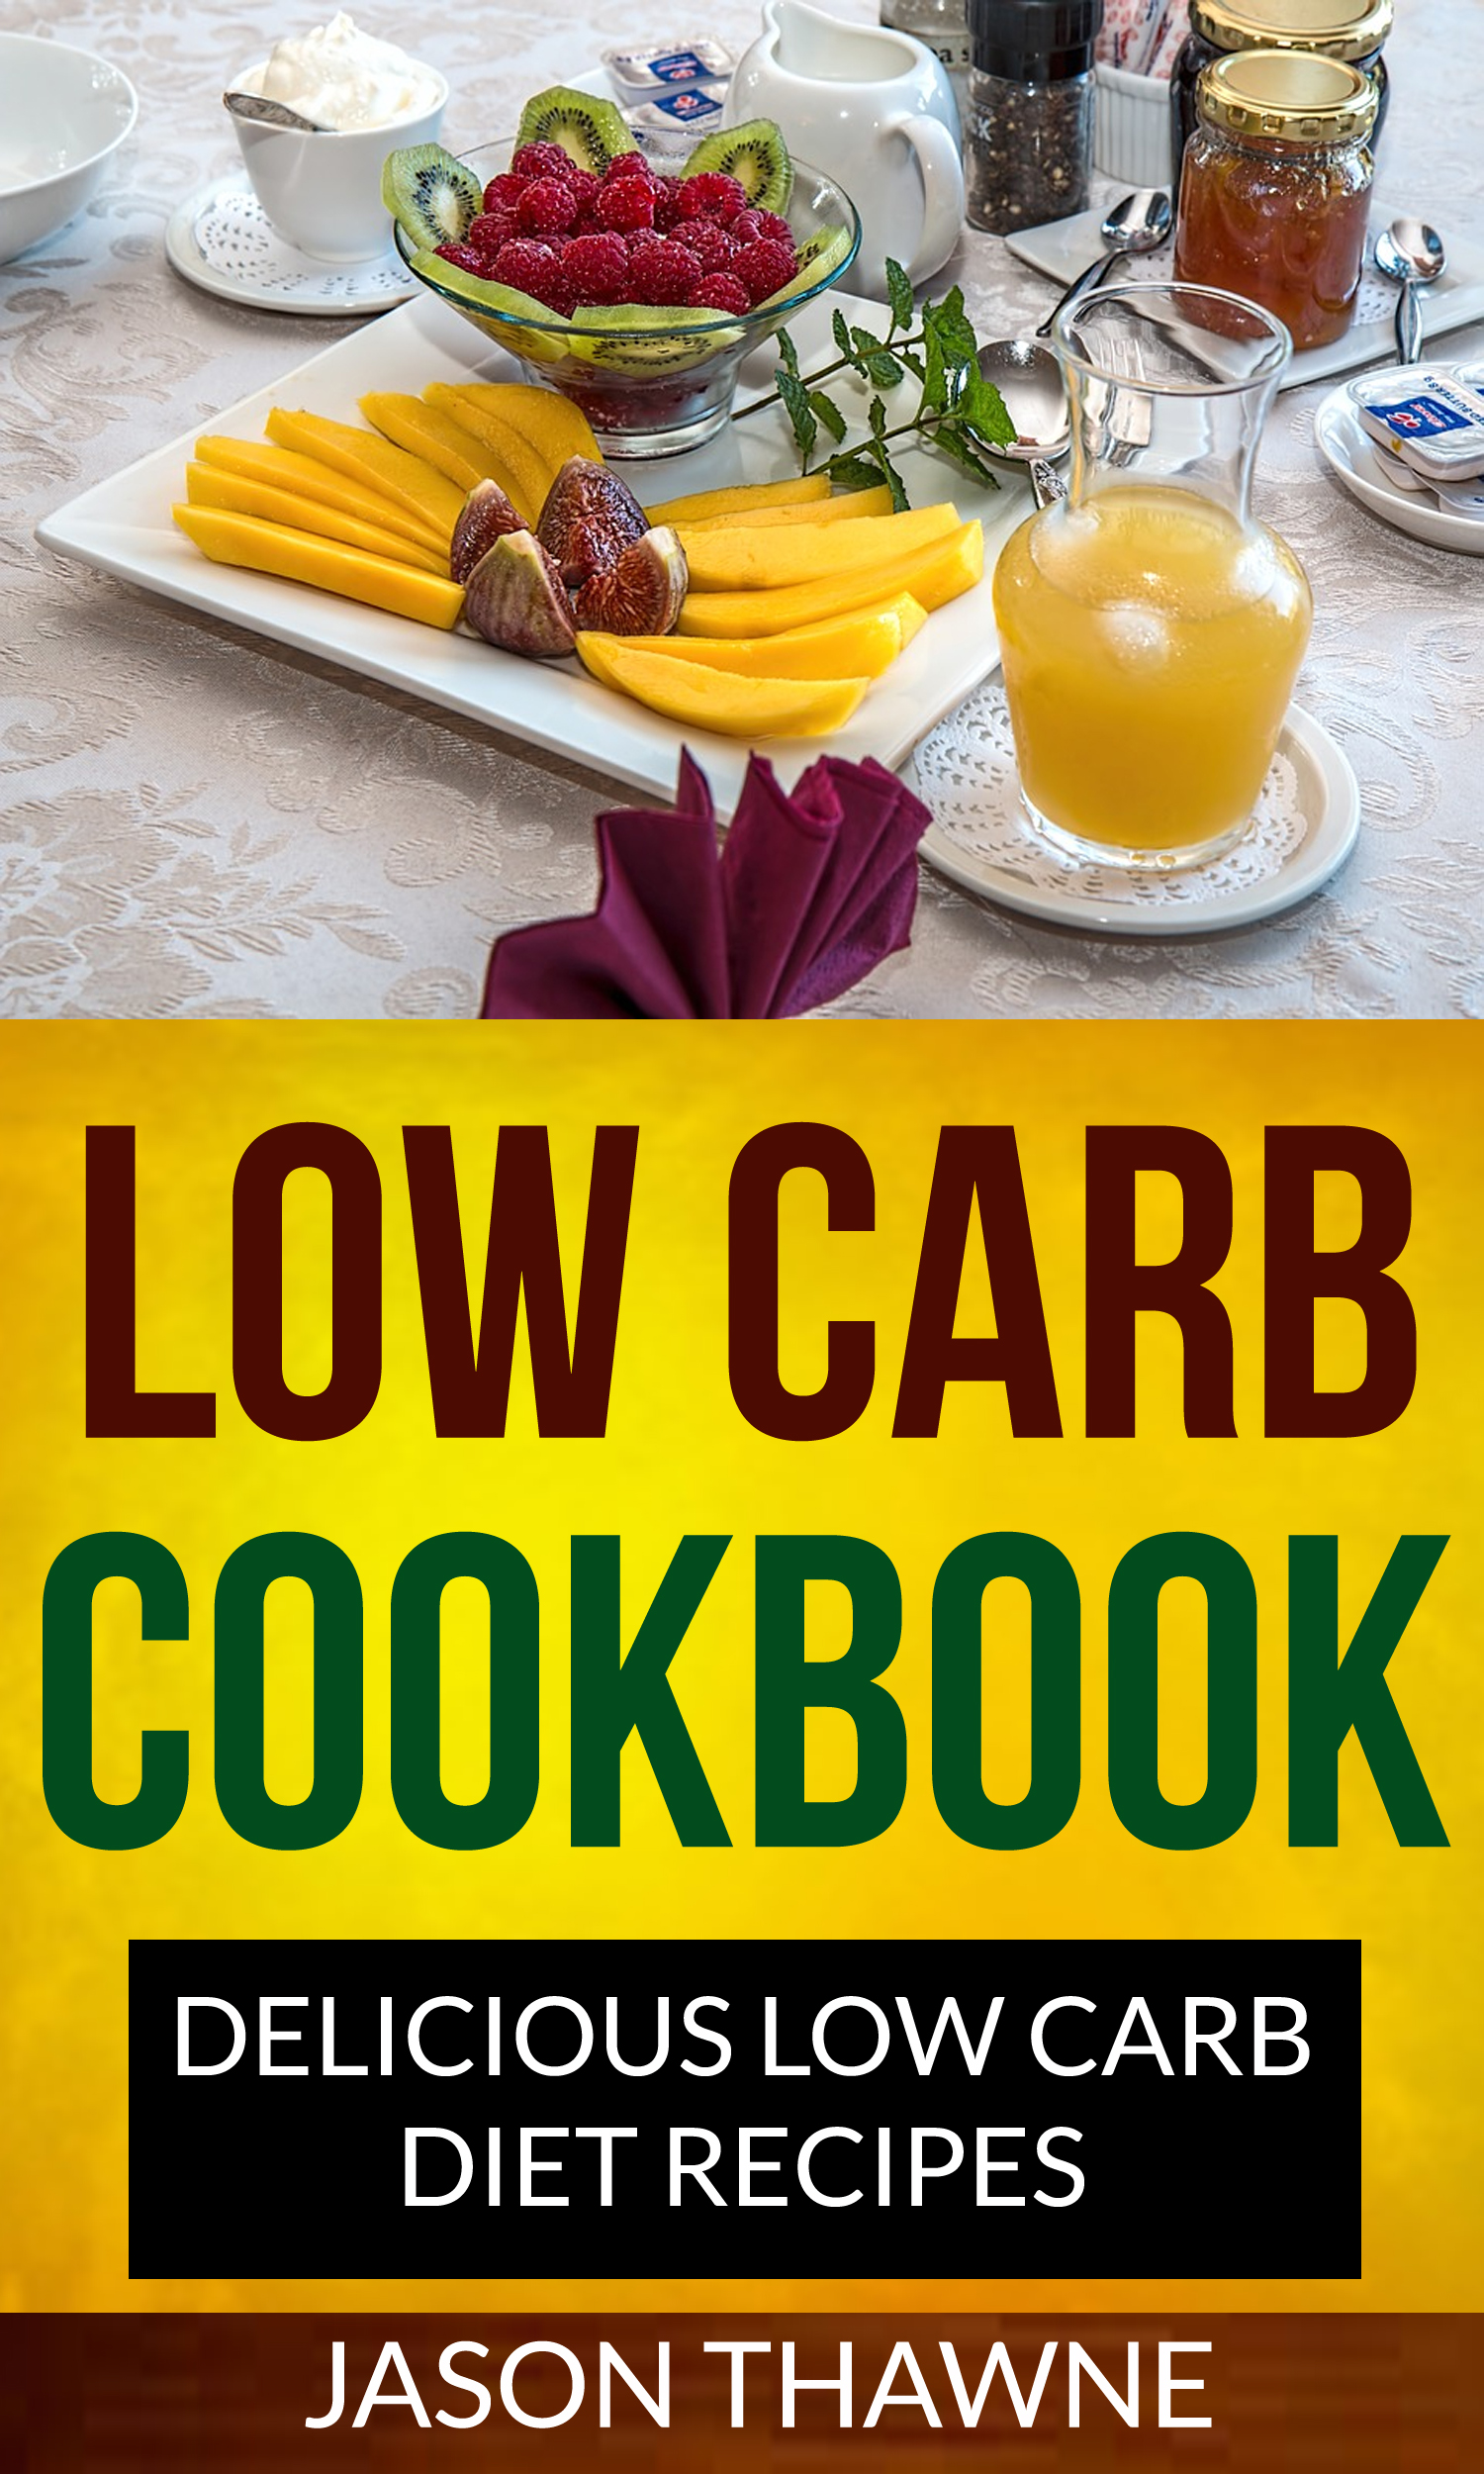 Low carb cookbook: delicious low carb diet recipes